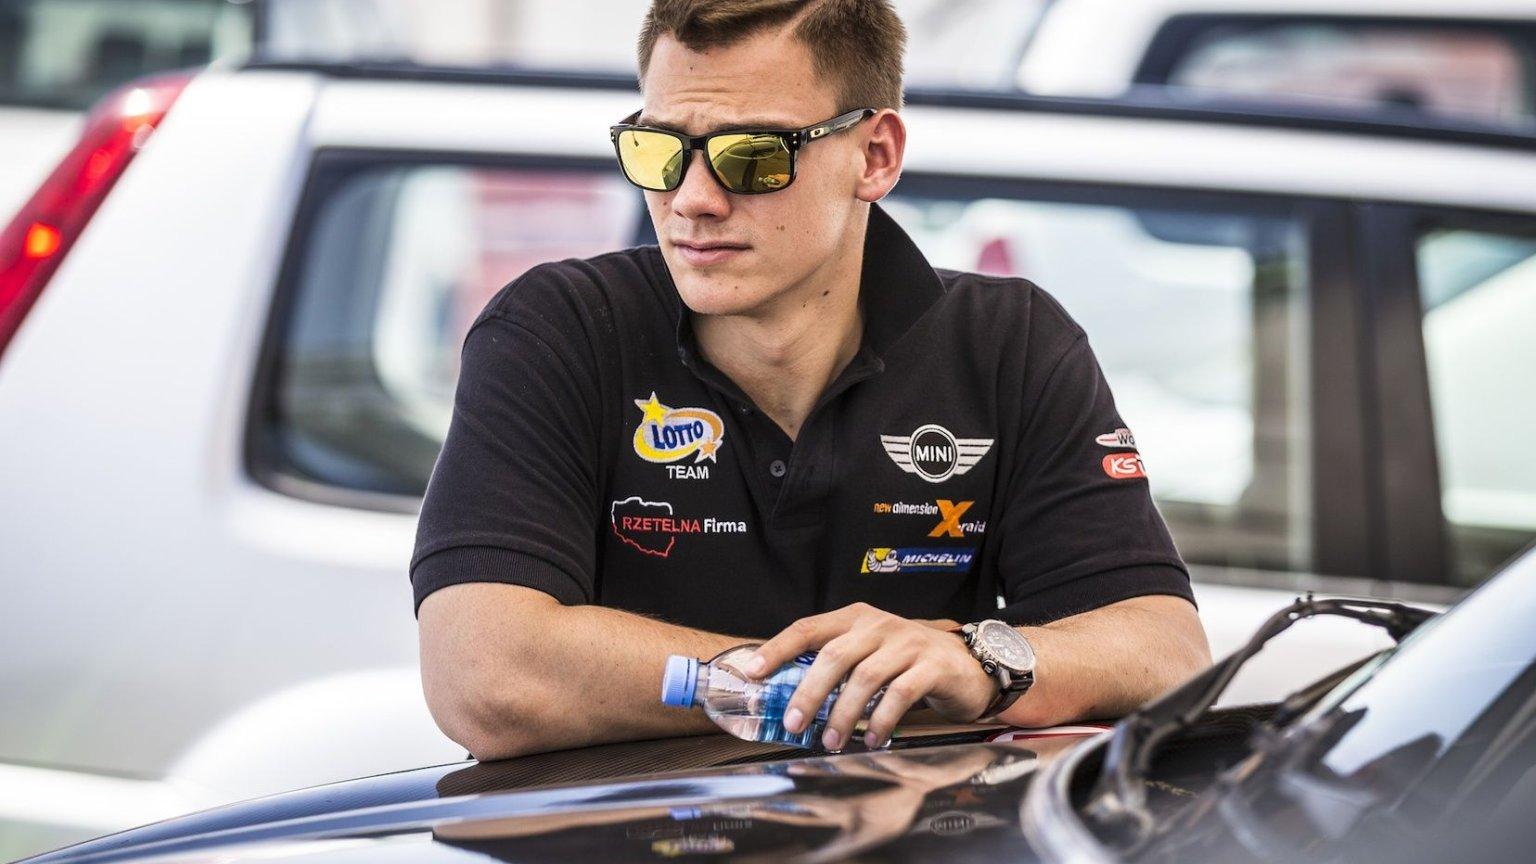 Martin Kaczmarski